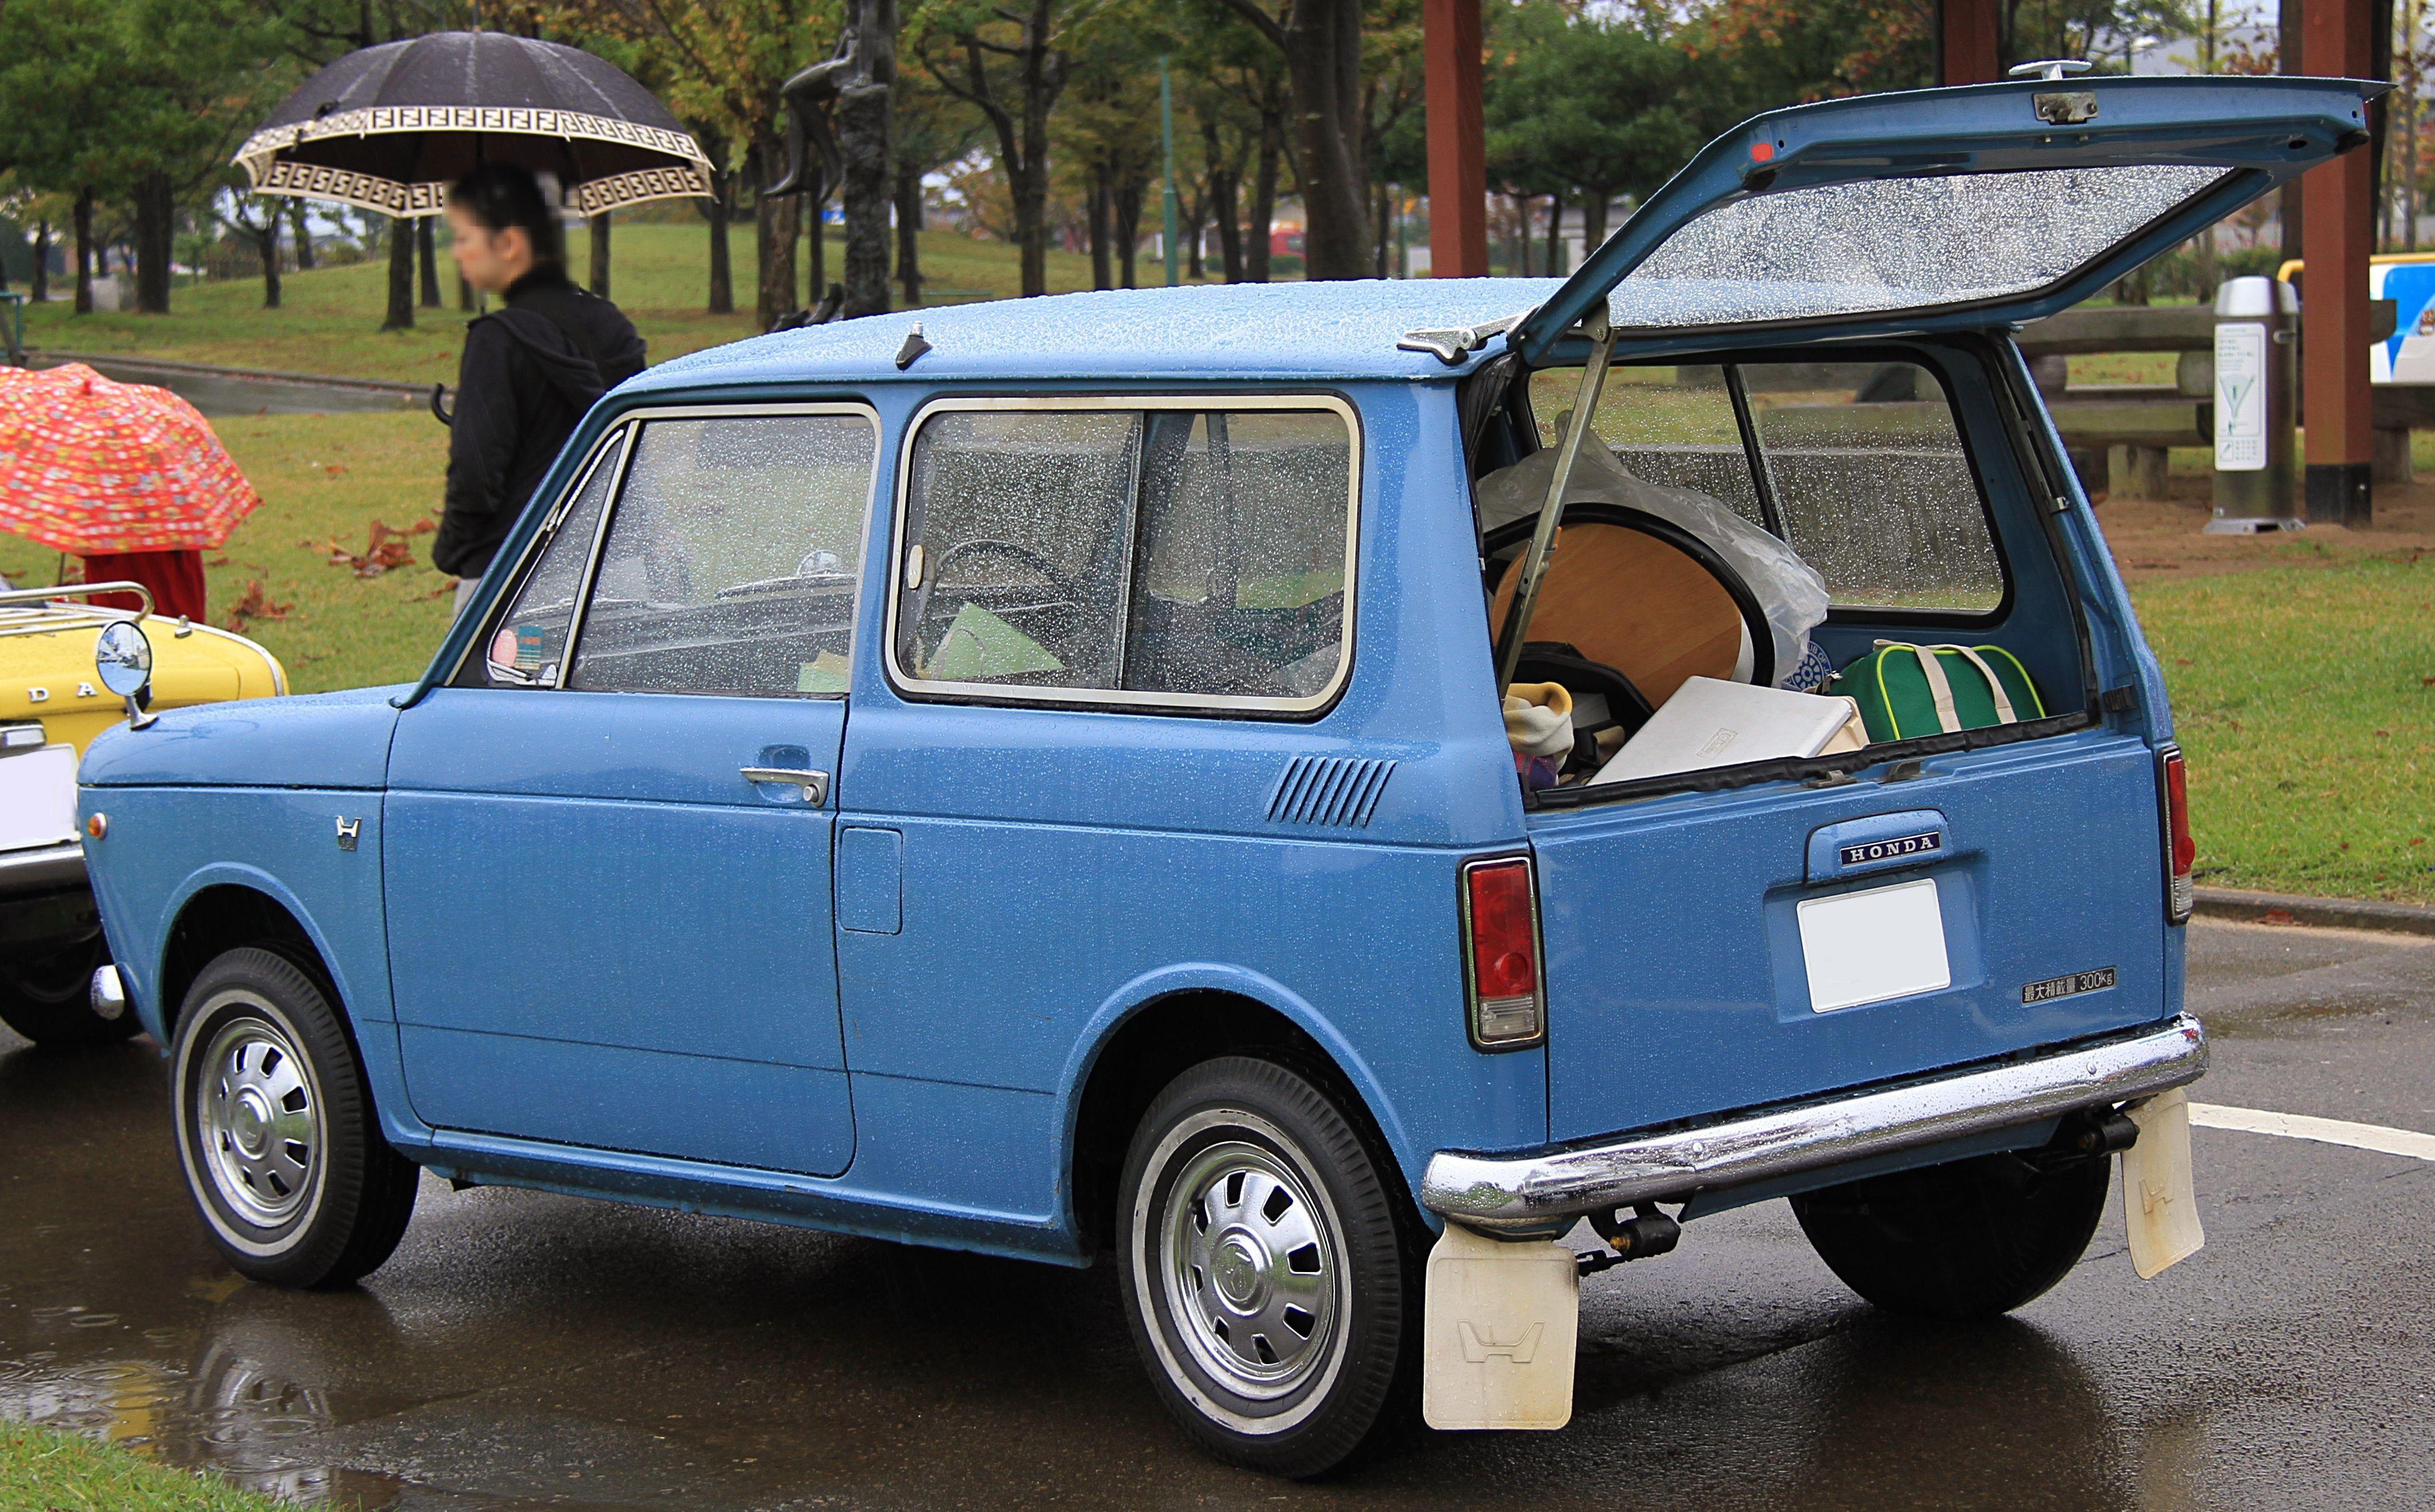 Honda N600 For Sale File:1967 Honda LN360 rear.jpg - Wikimedia Commons